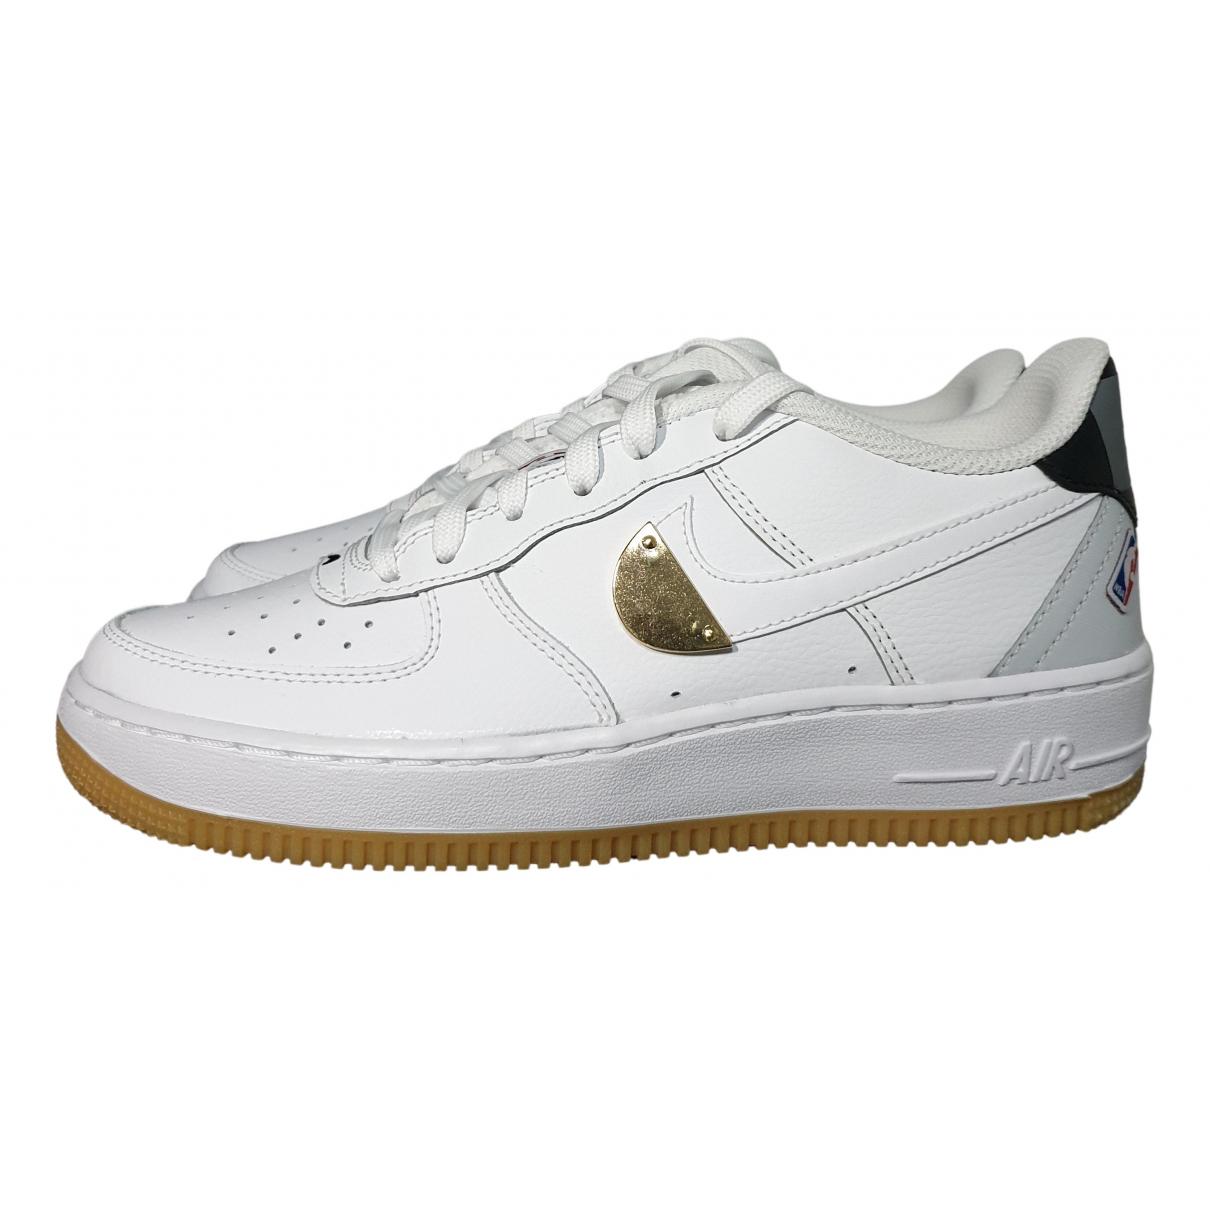 Nike - Baskets Air Force 1 pour femme en cuir - blanc